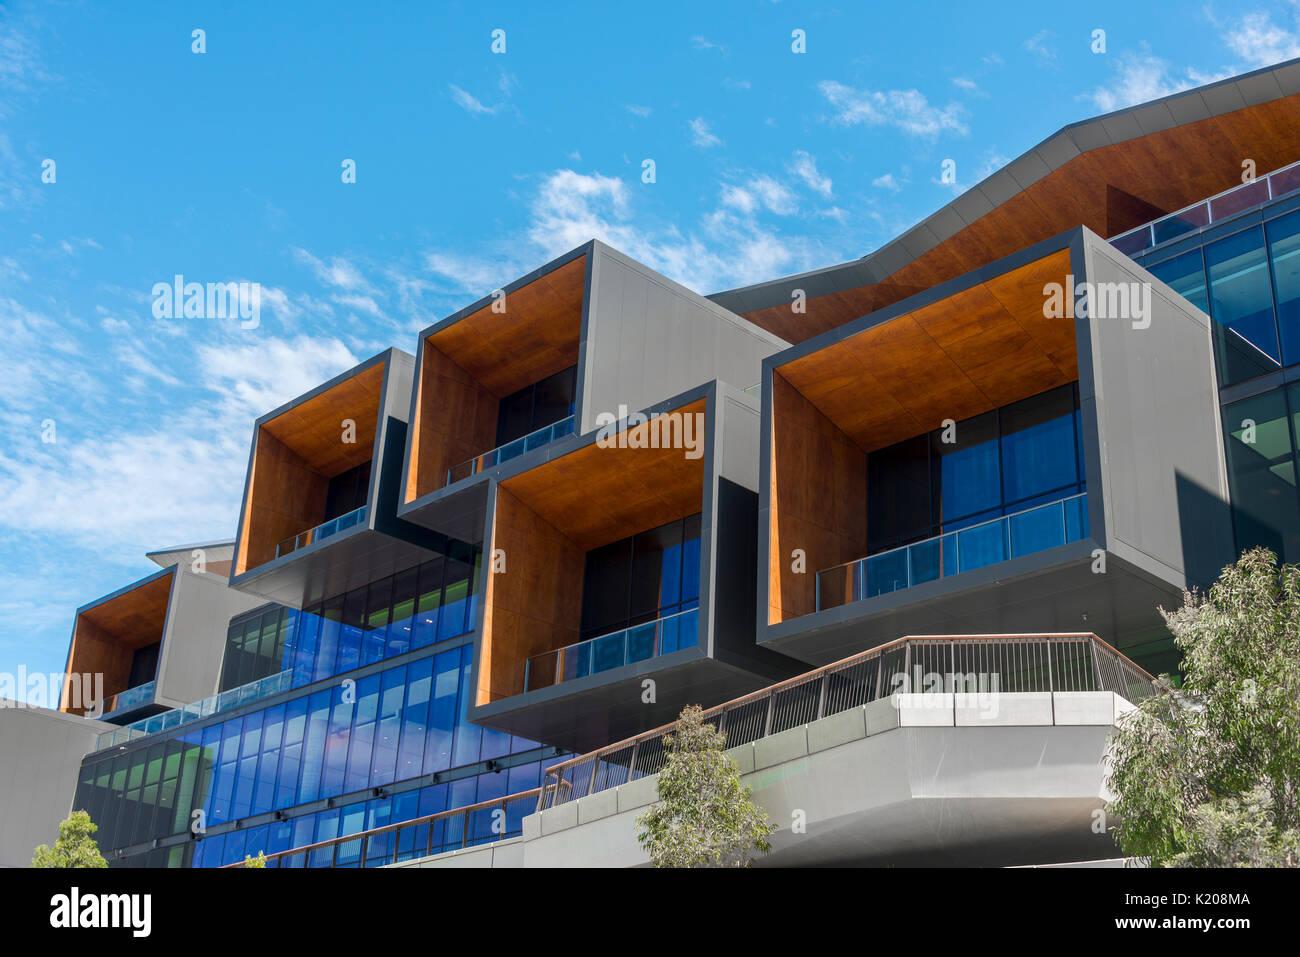 Arquitectura moderna, Darling Harbour, Nueva Gales del Sur, Australia Imagen De Stock